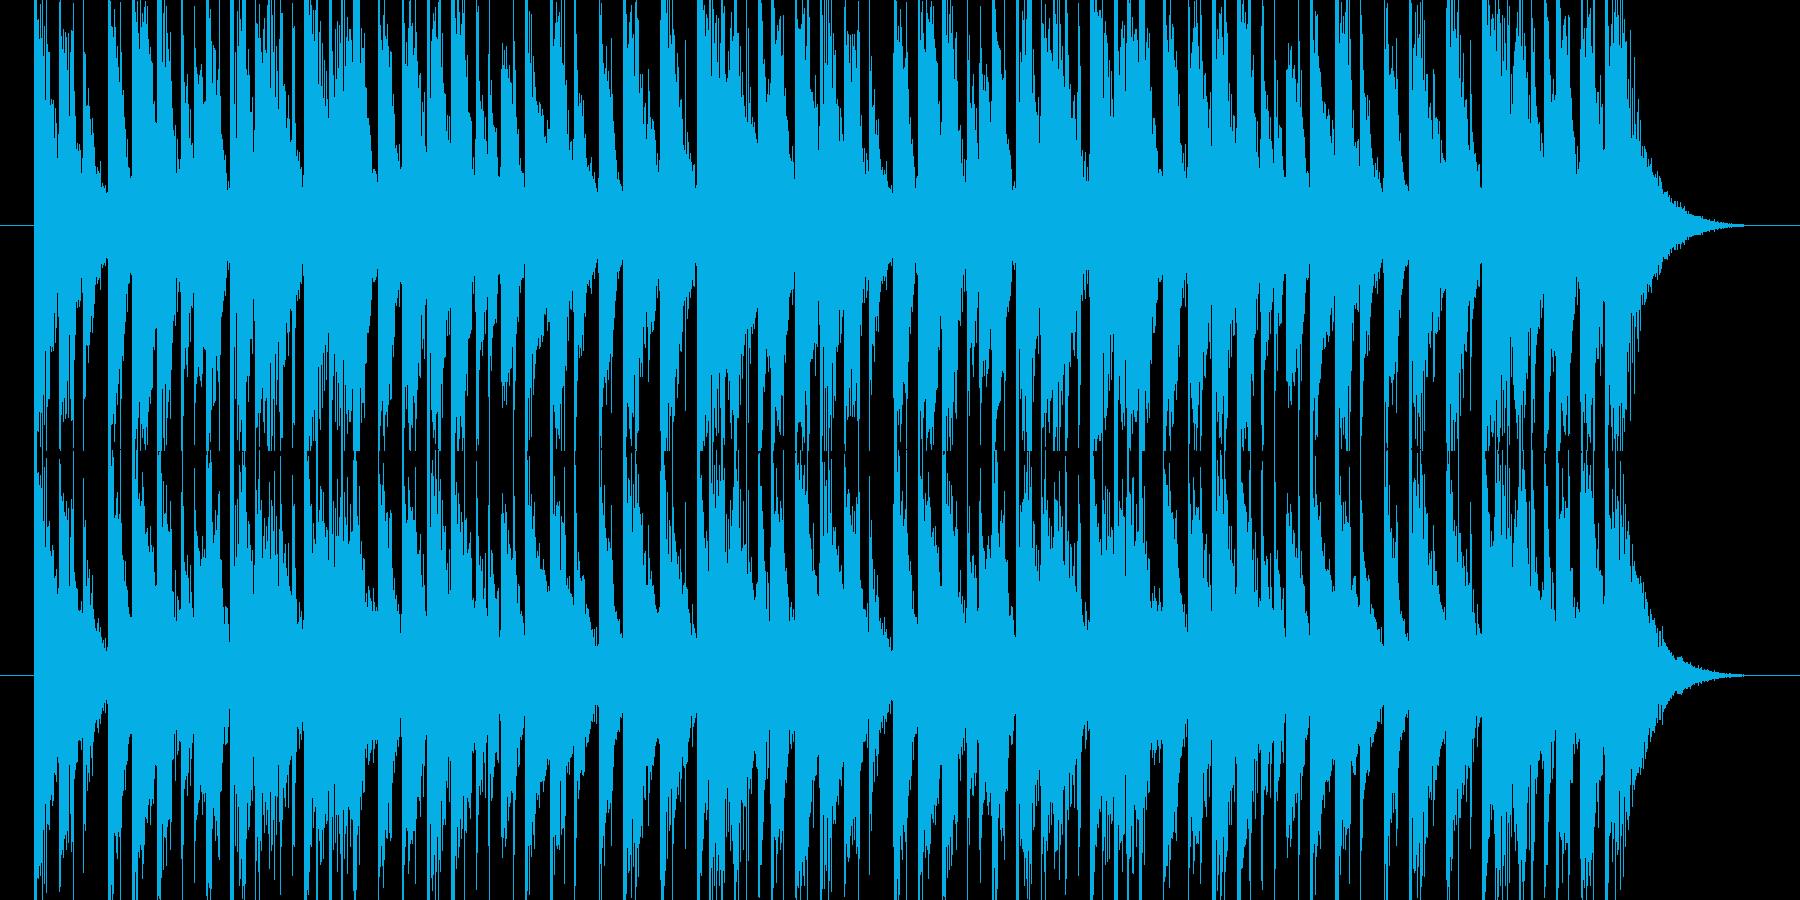 CMなどのジングルの再生済みの波形